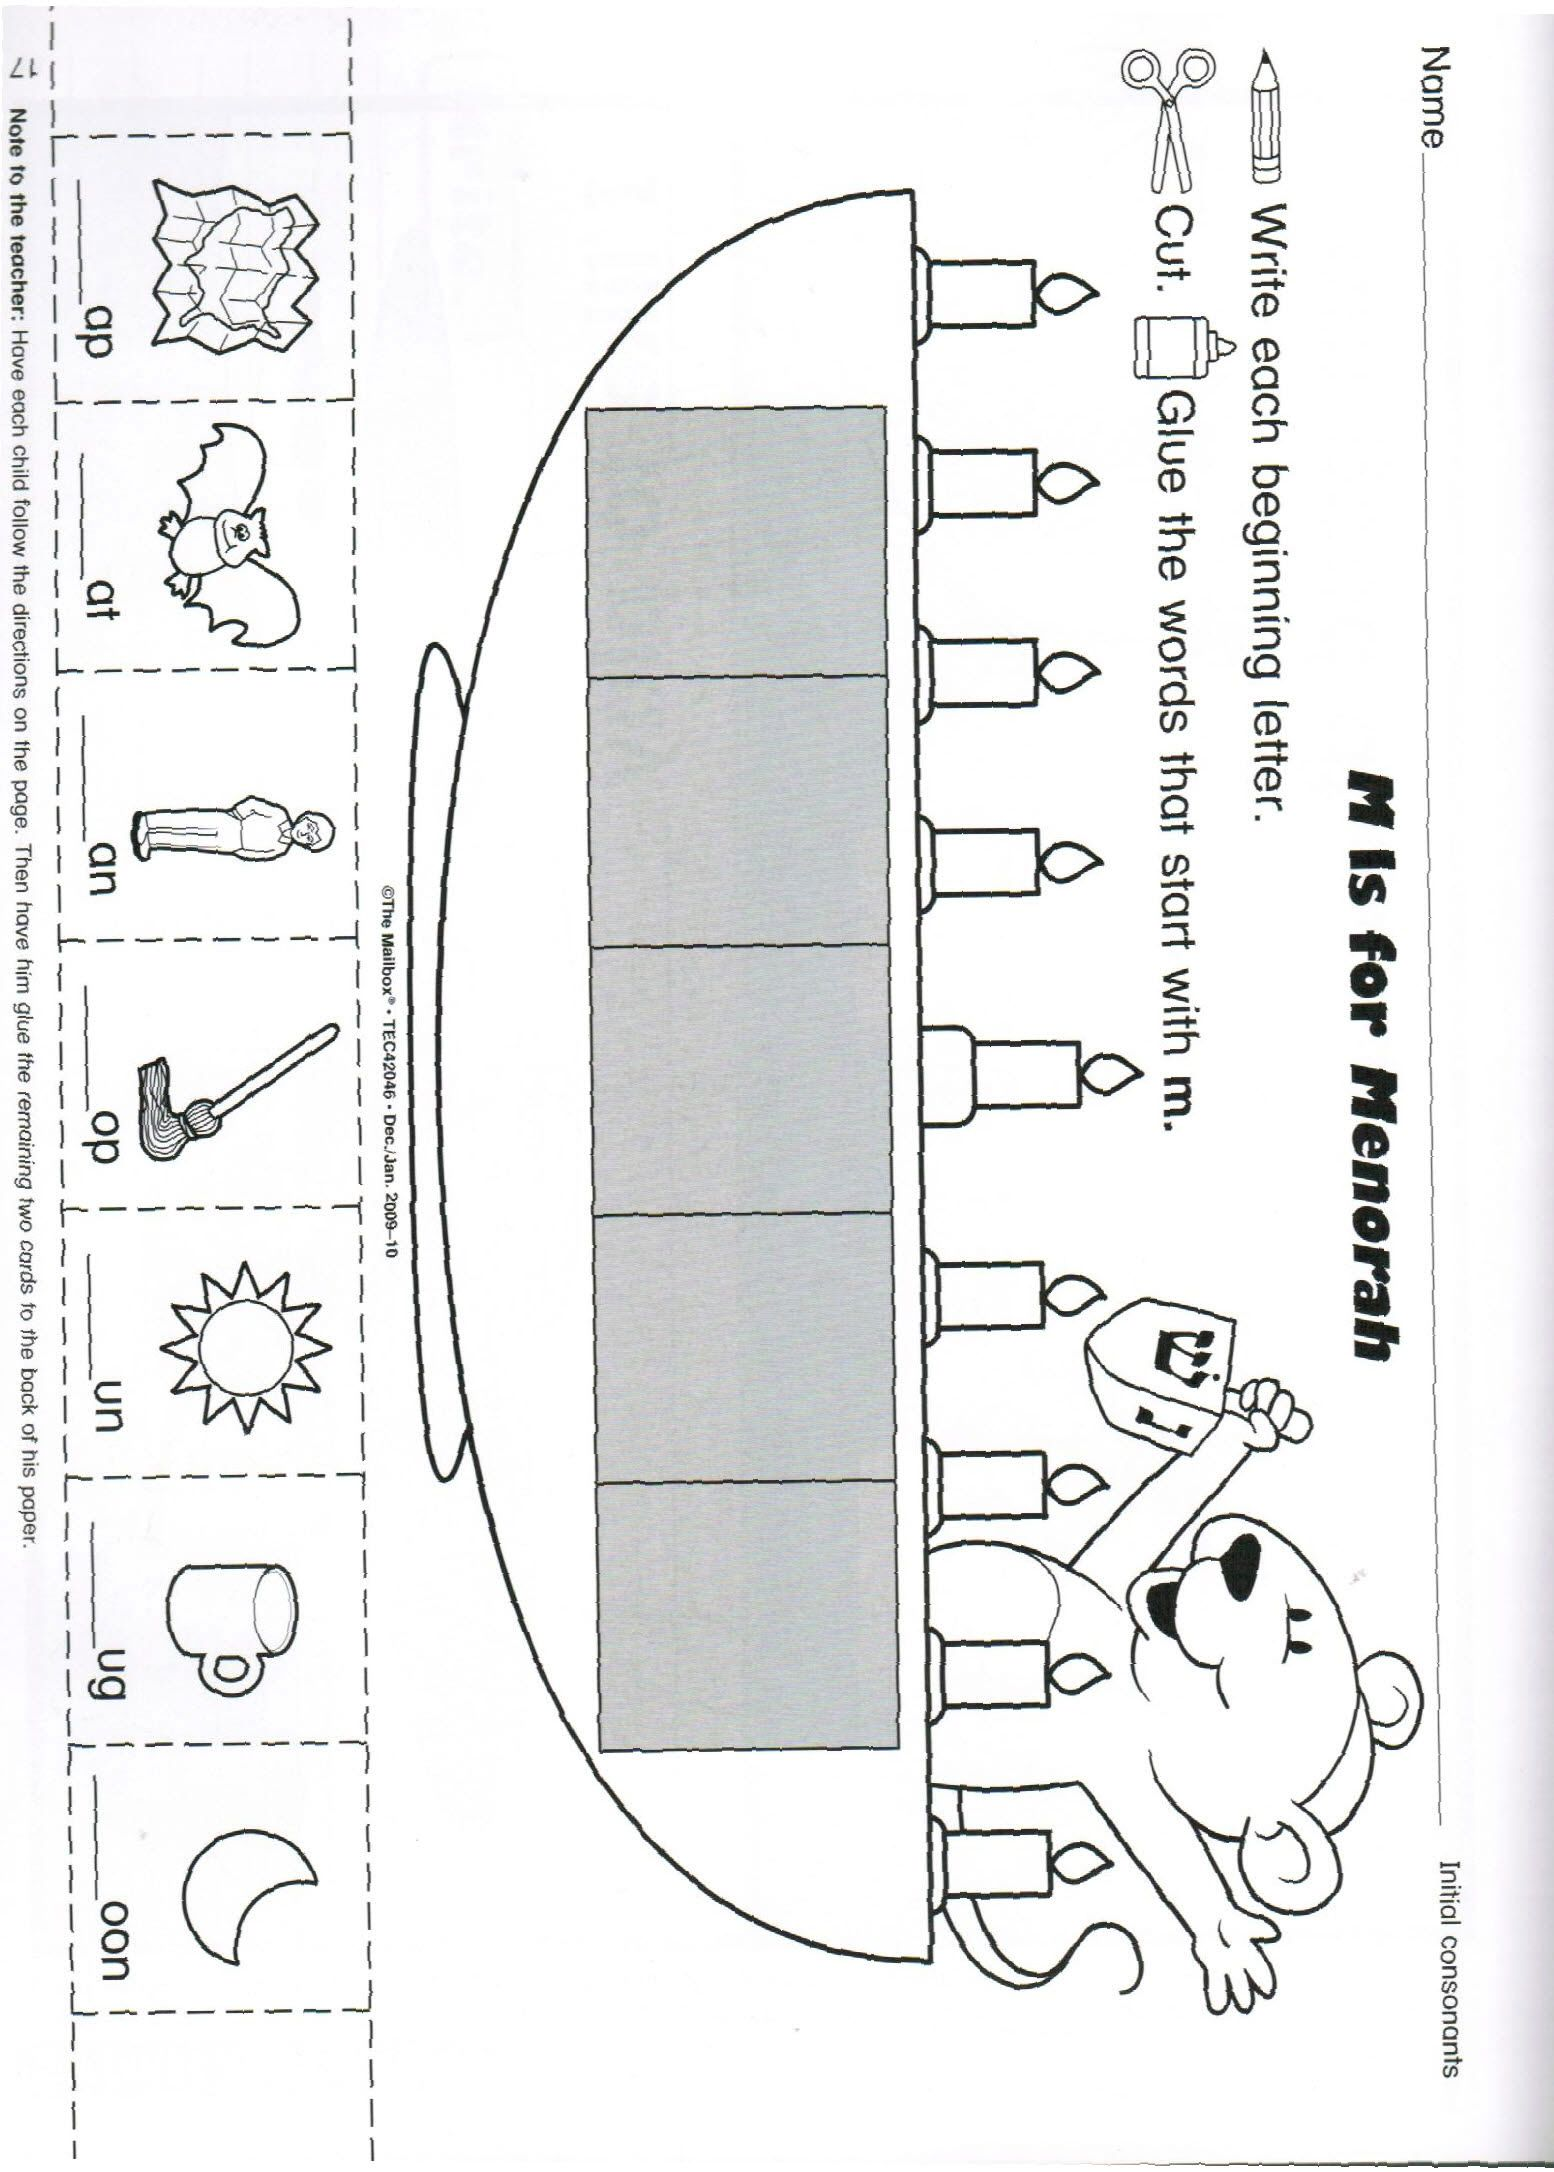 Hanukkah Reproducible Skill Page For Practicing Beginning